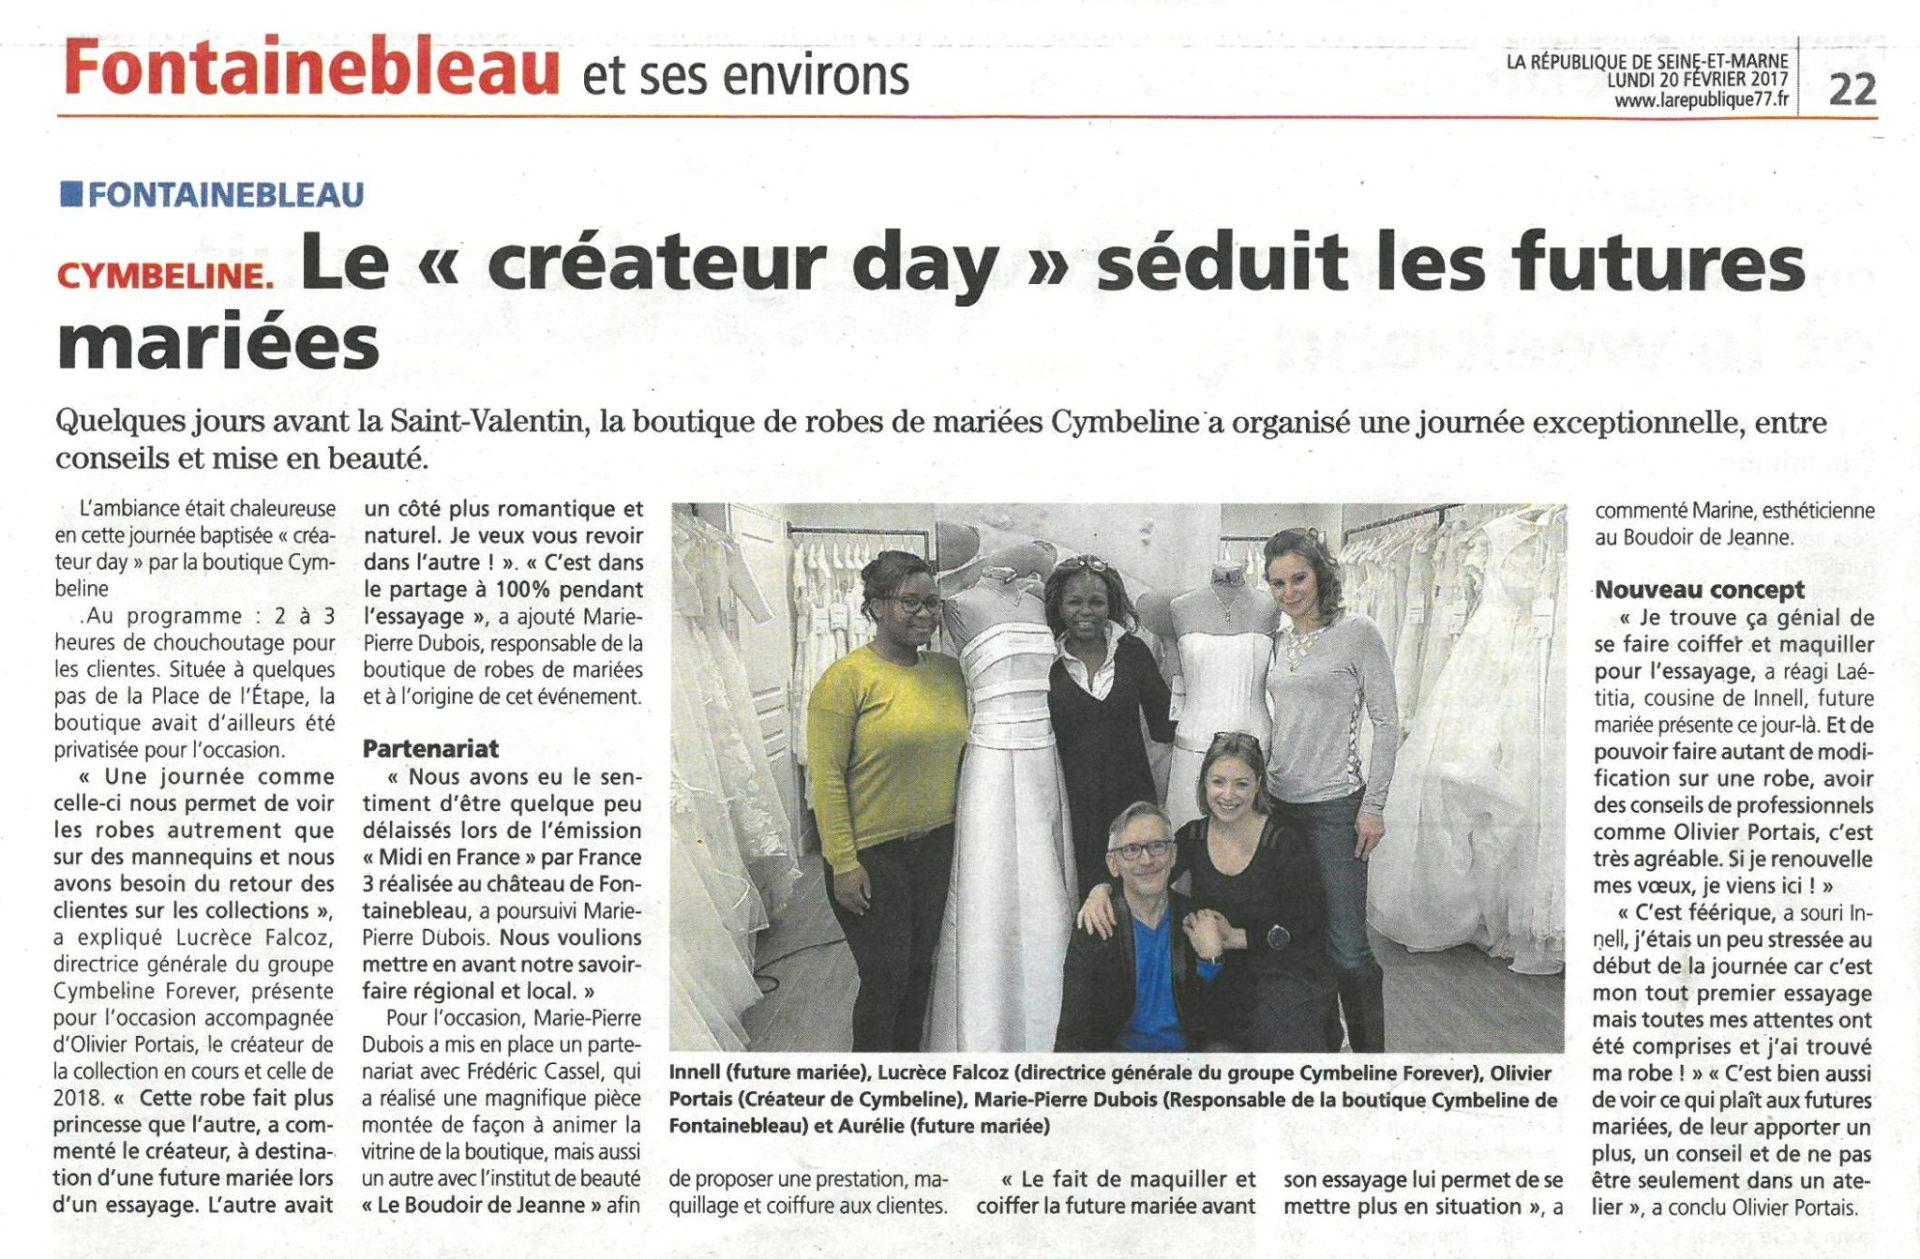 Designer day Cymbeline Fontainebleau